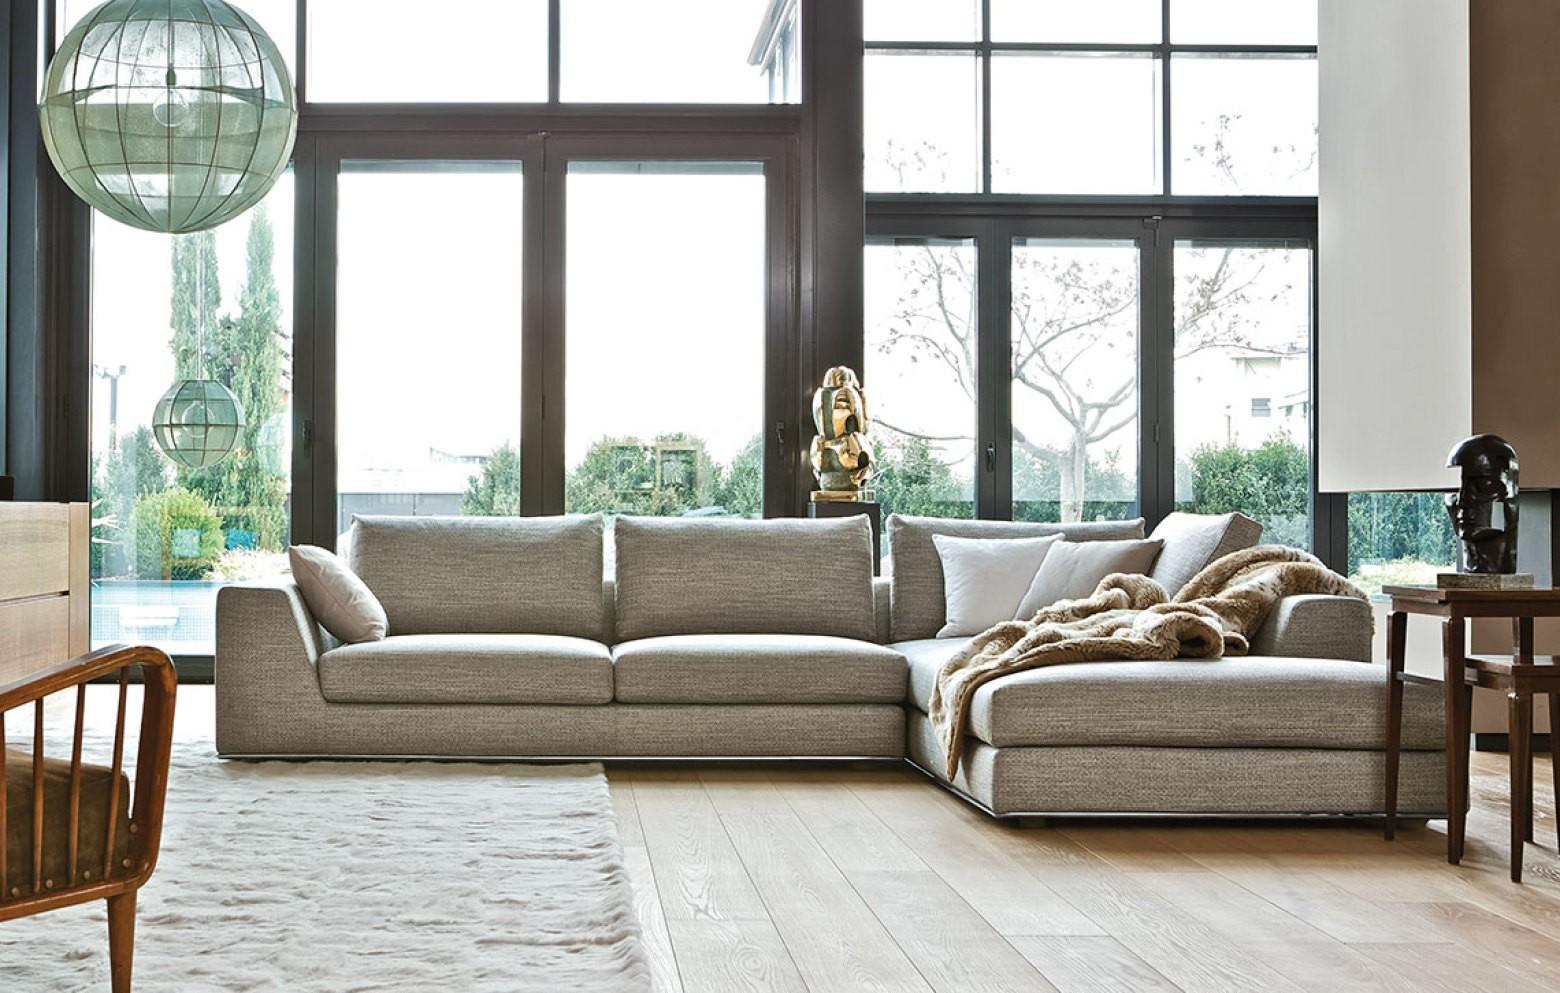 liverpool sonderedition ecksofas polsterm bel who 39 s. Black Bedroom Furniture Sets. Home Design Ideas